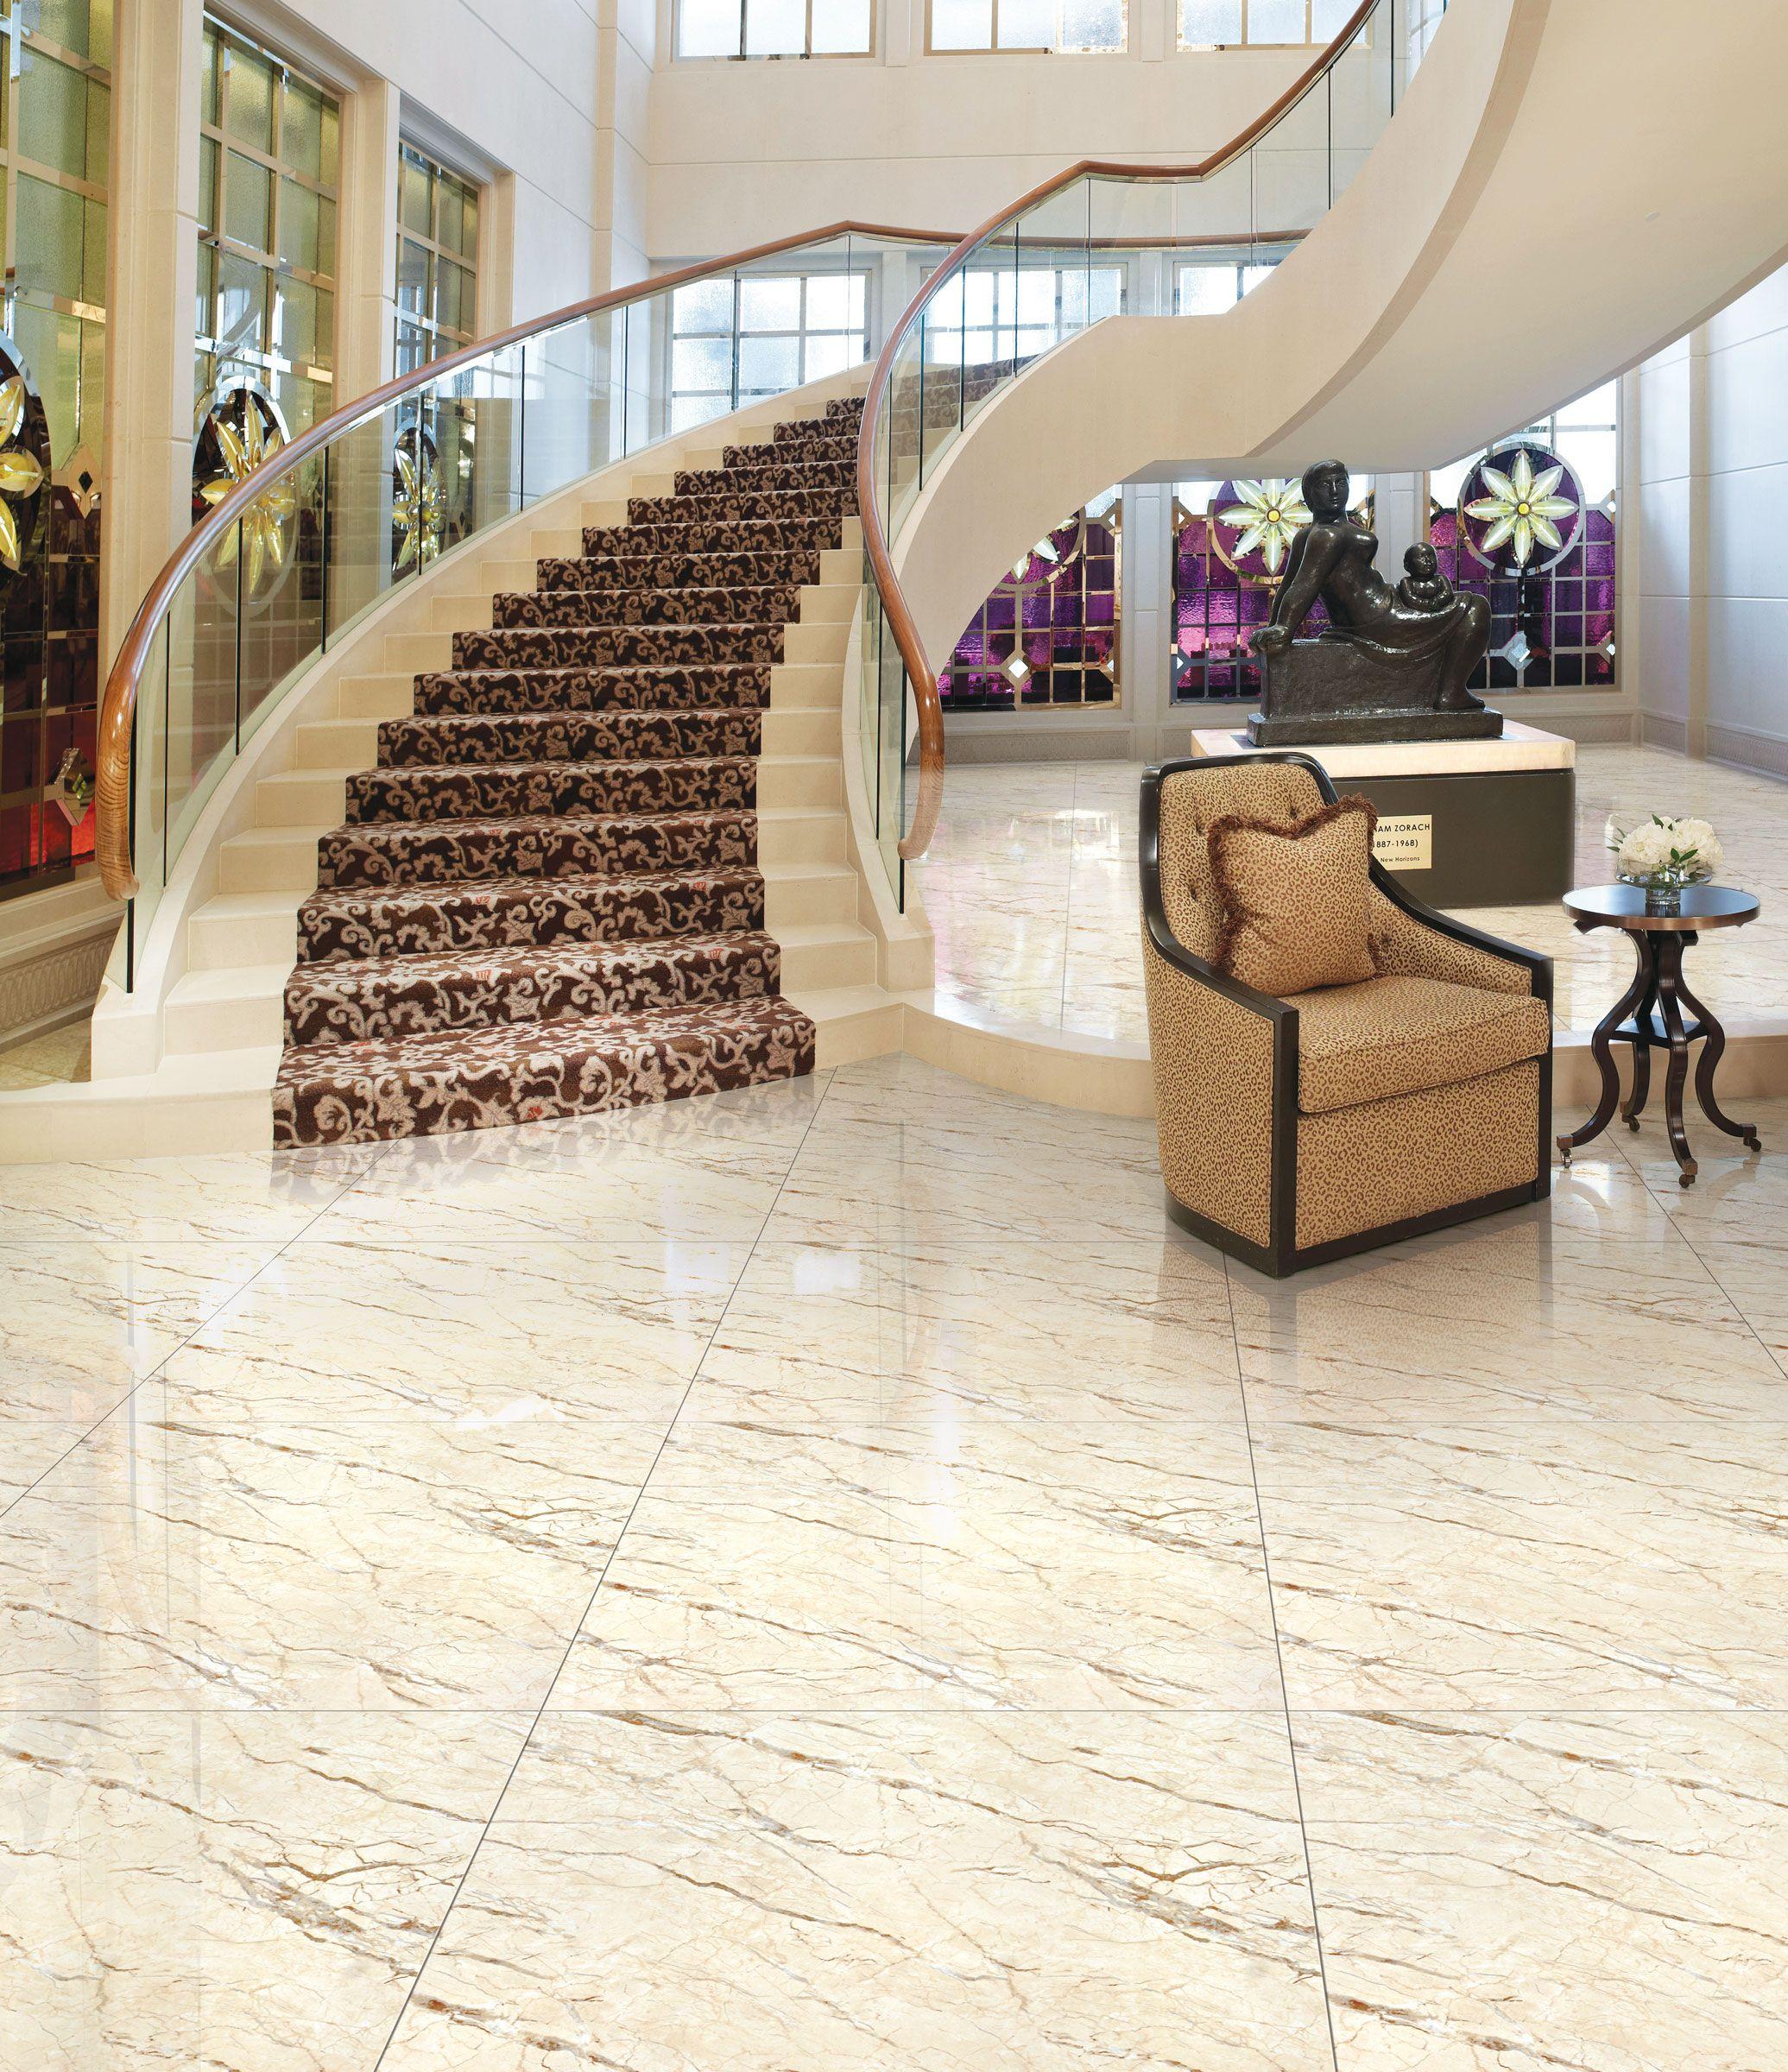 Vitrified Floor Tiles Design For Living Room Modern Rooms With Grey Sofas Buy Designer Wall Bathroom Bedroom Kitchen Livingroom Office Exterior Ceramic Online India